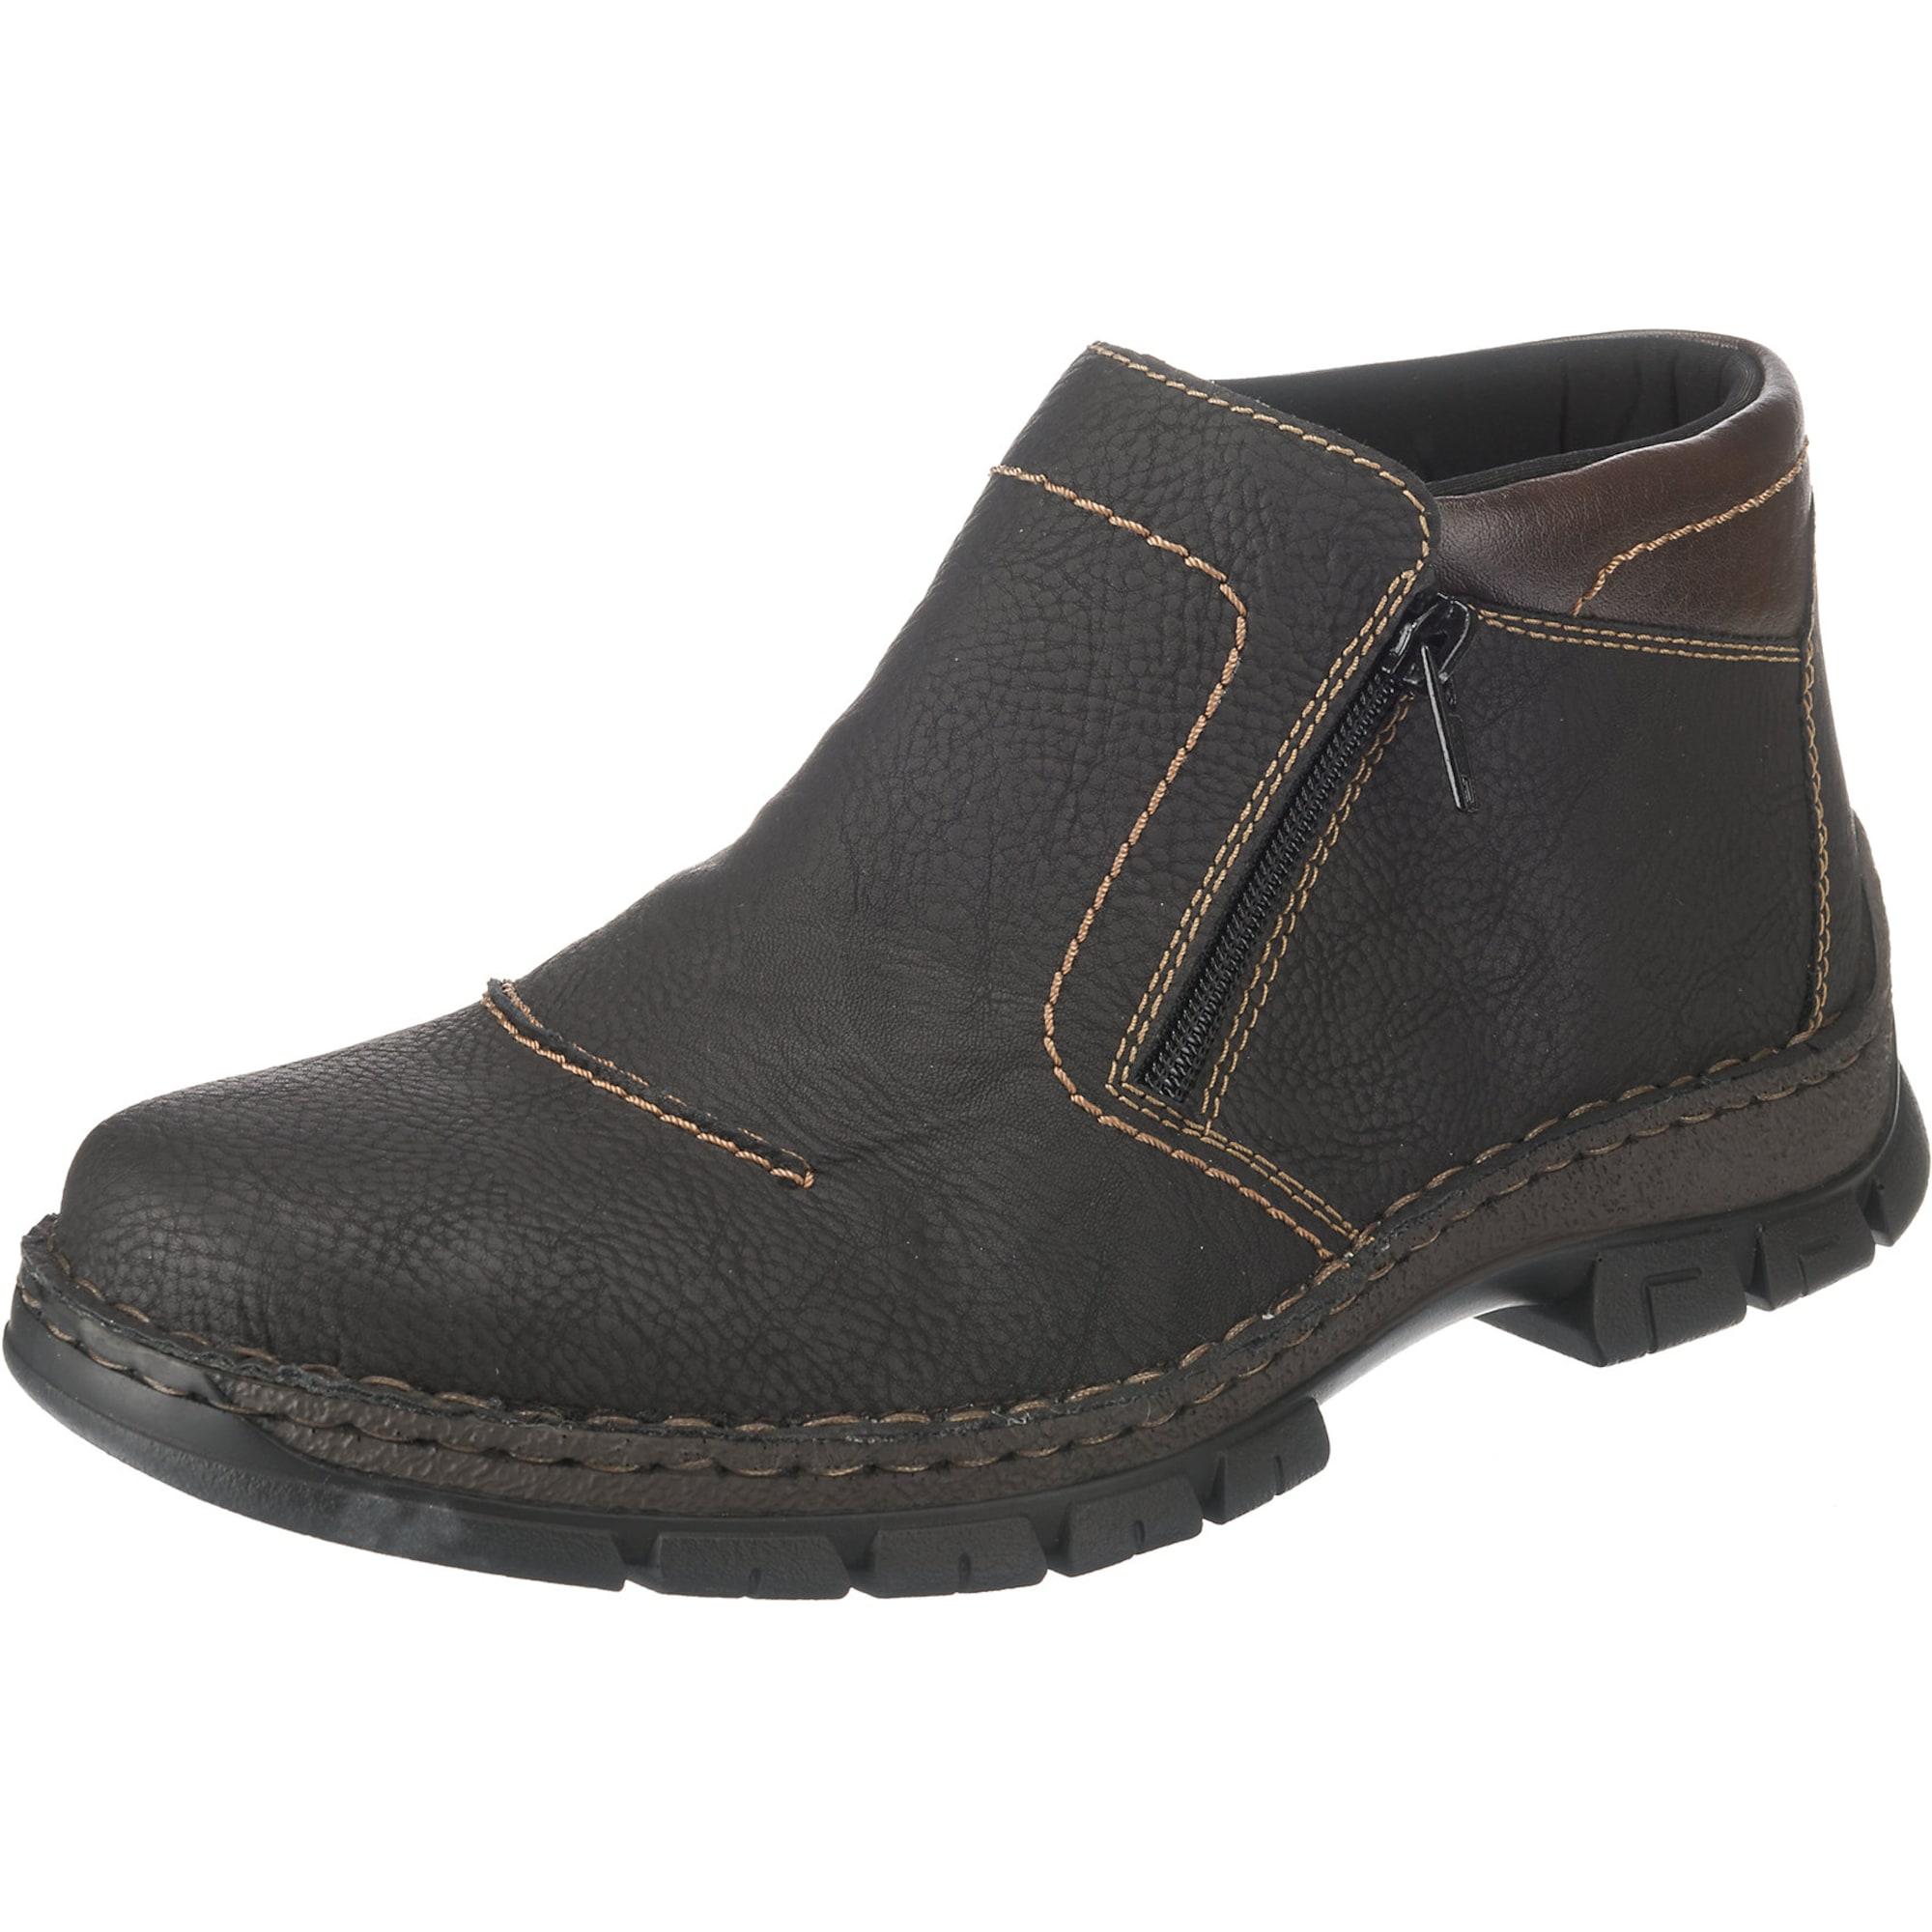 Winterstiefeletten | Schuhe > Boots > Winterstiefel | Braun | RIEKER